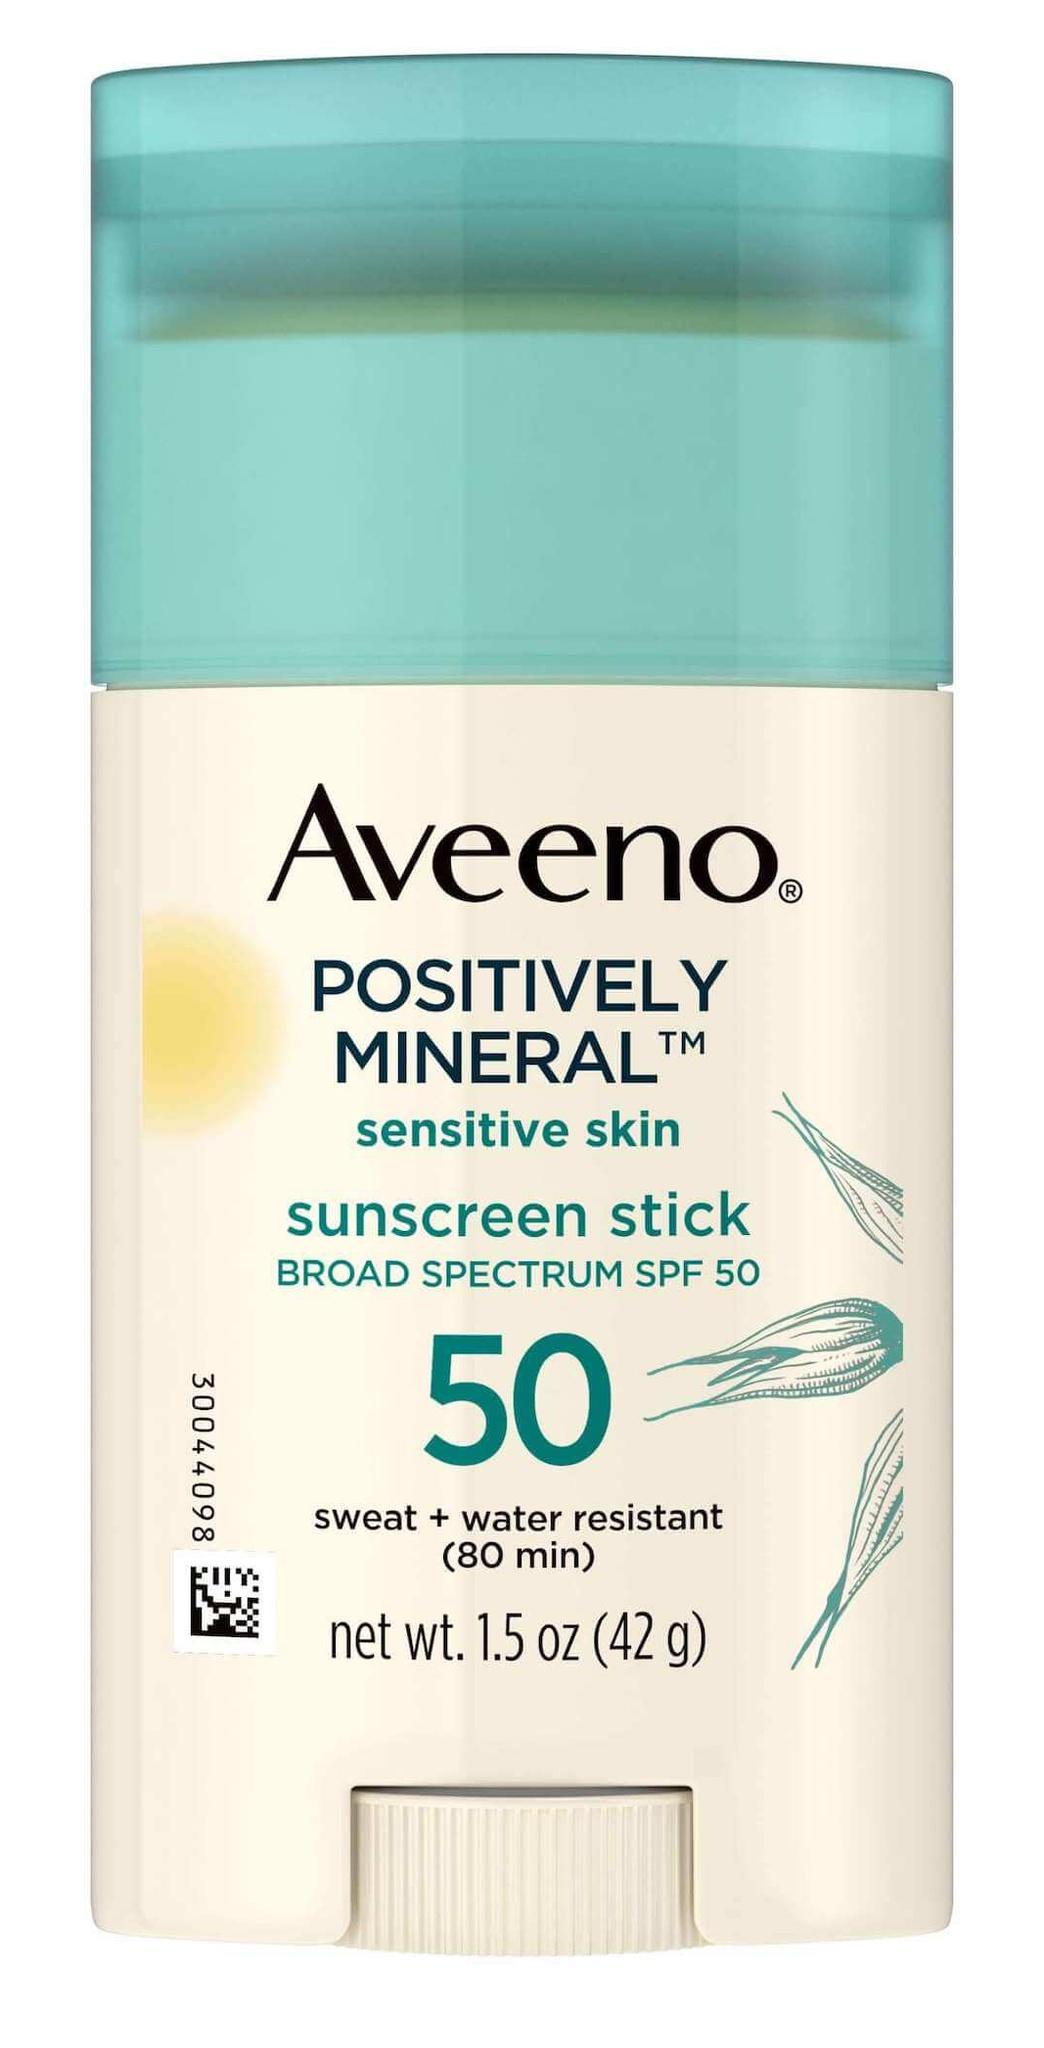 Aveeno Sensitive Skin SPF 50 Mineral Sunscreen Stick Broad Spectrum UVA+UVB